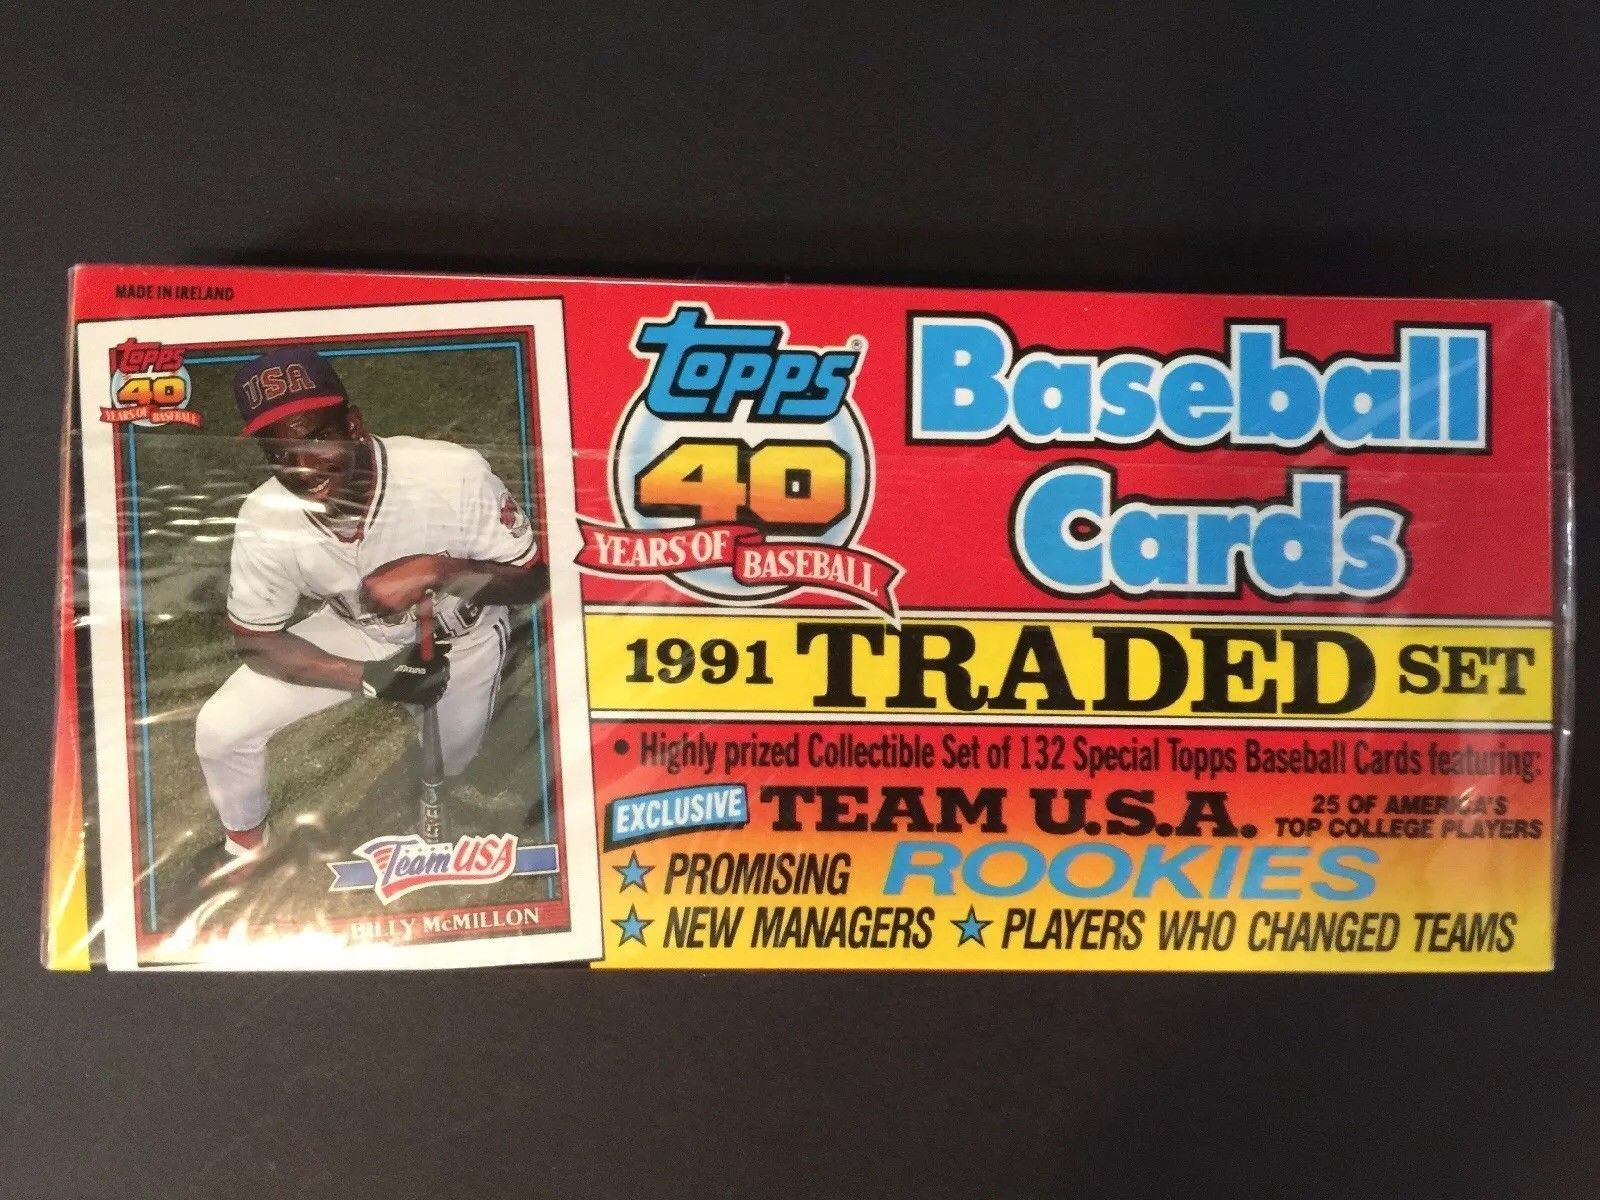 Traded Set 1991 Topps 40 Years Of Baseball Baseball Cards